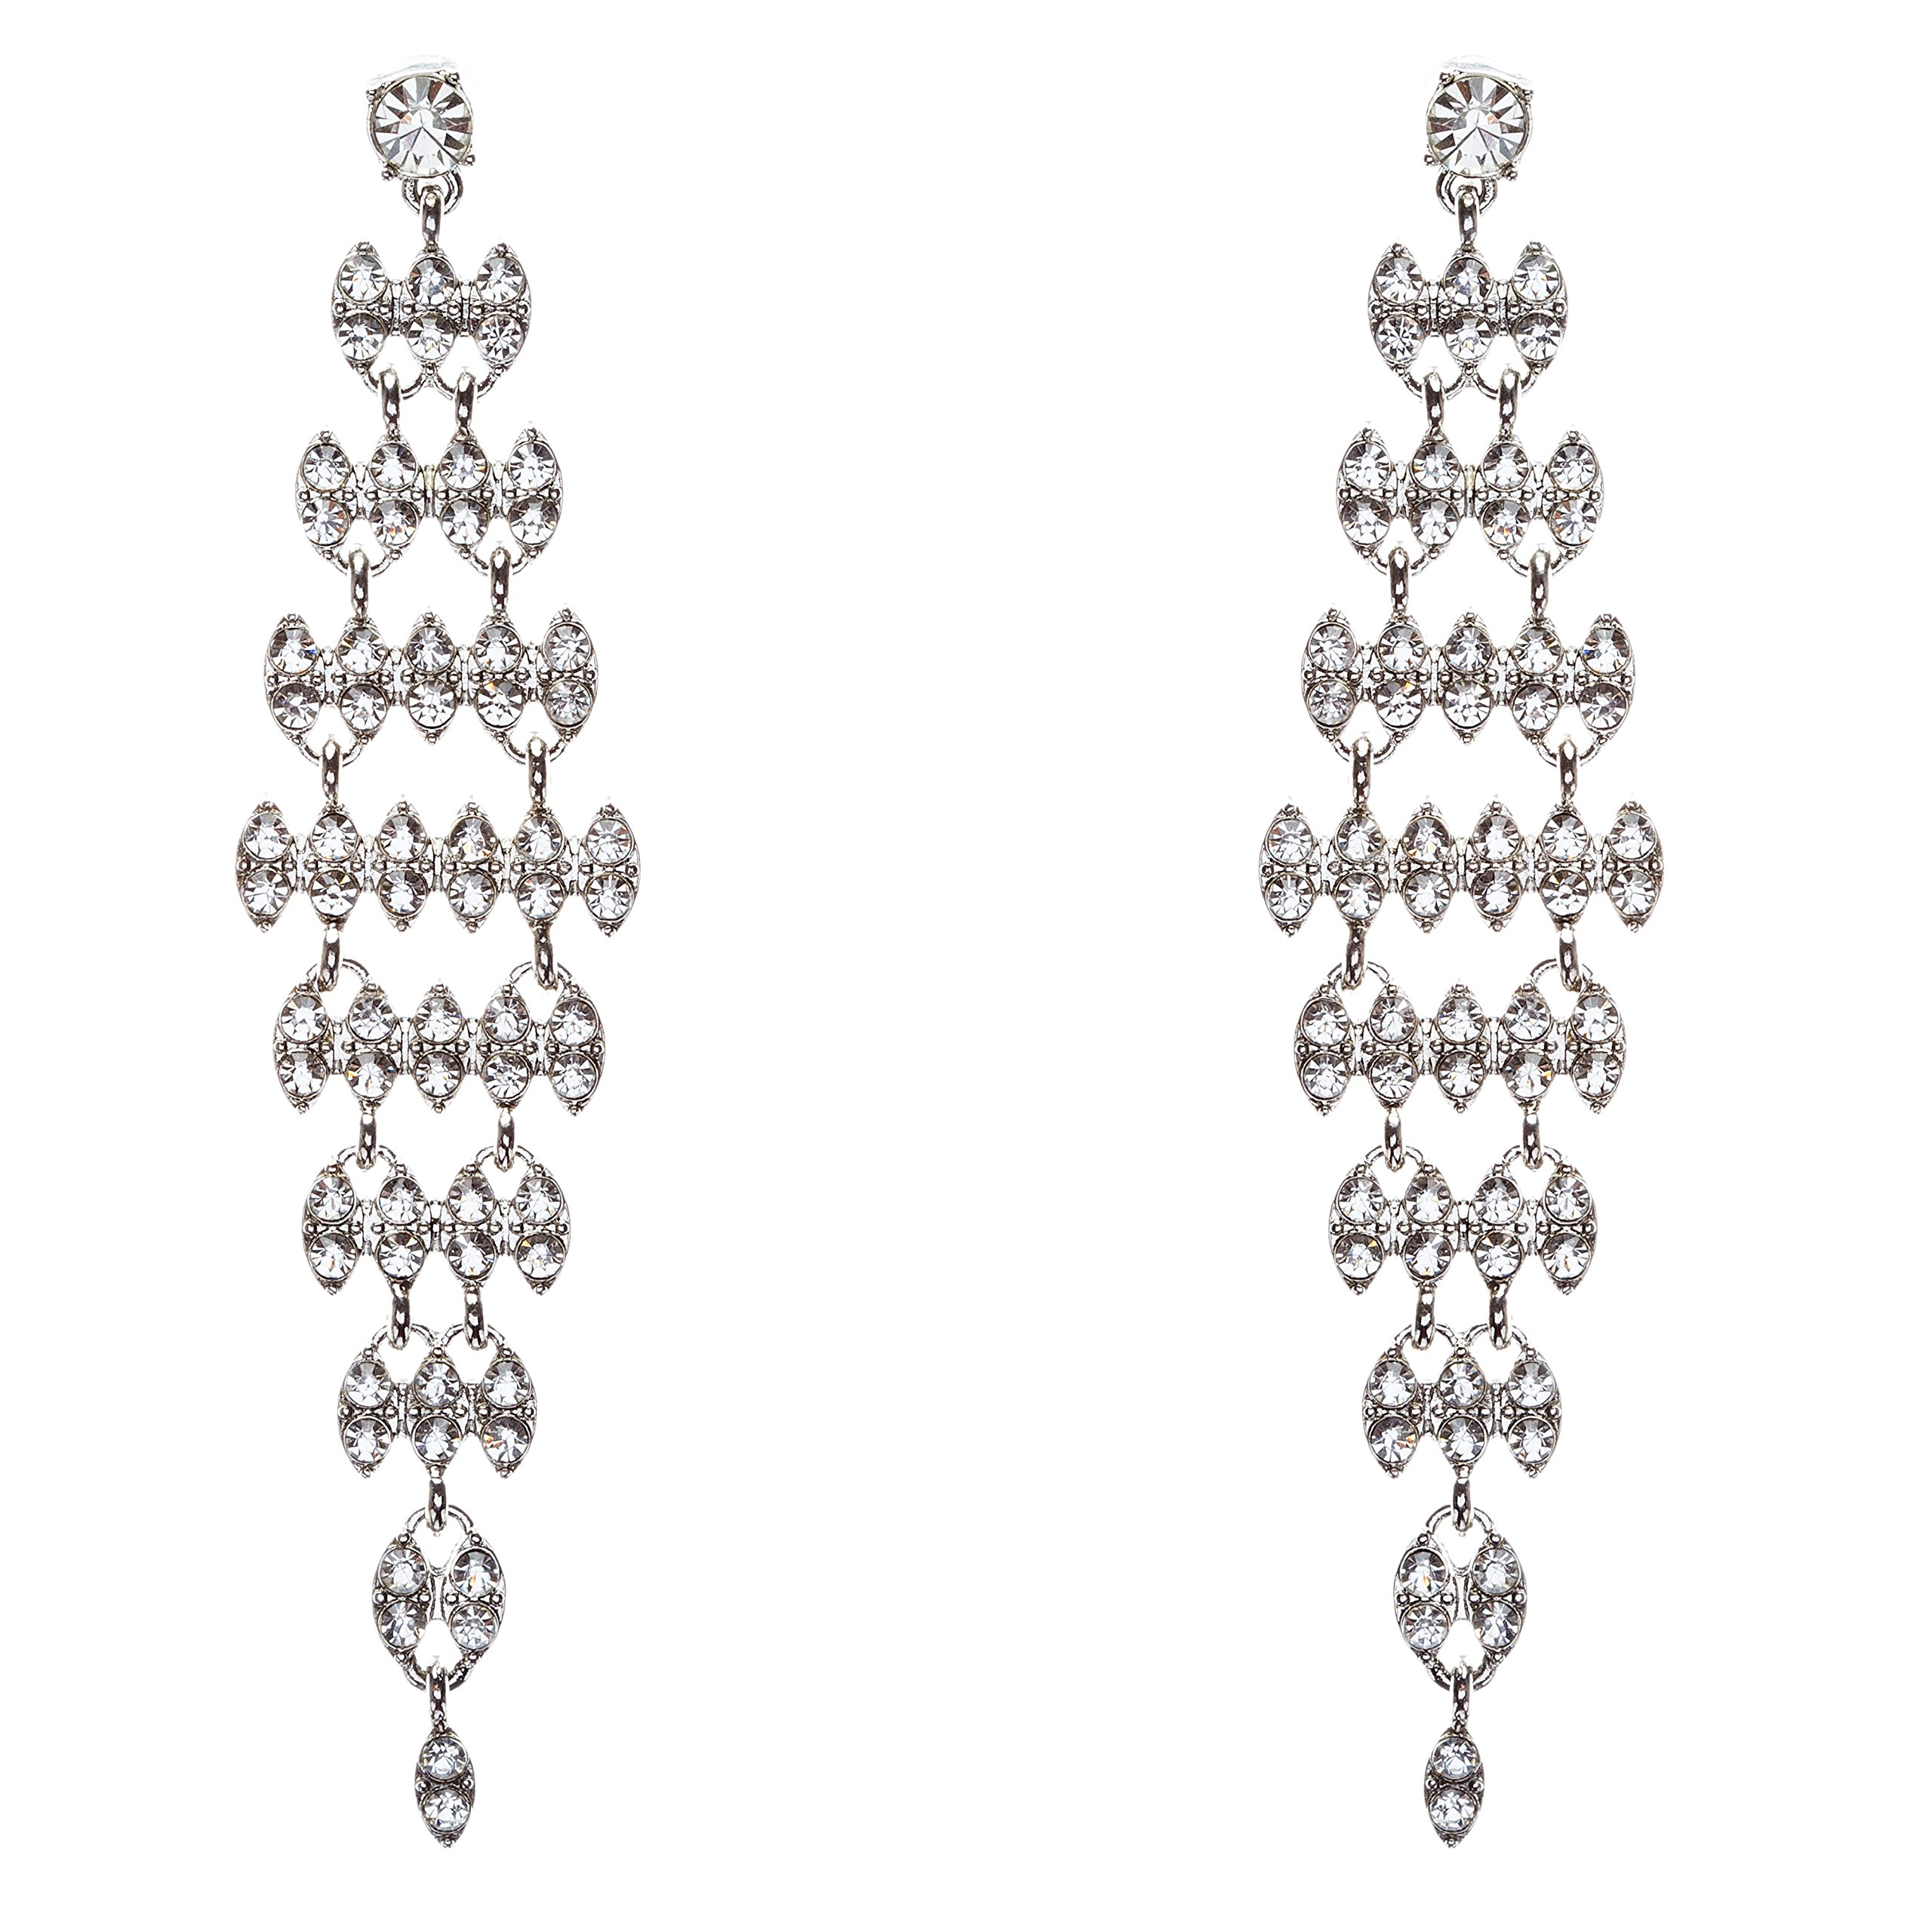 Bridal Wedding Jewelry Crystal Rhinestone Stylish Dangle Earrings E806 Silver